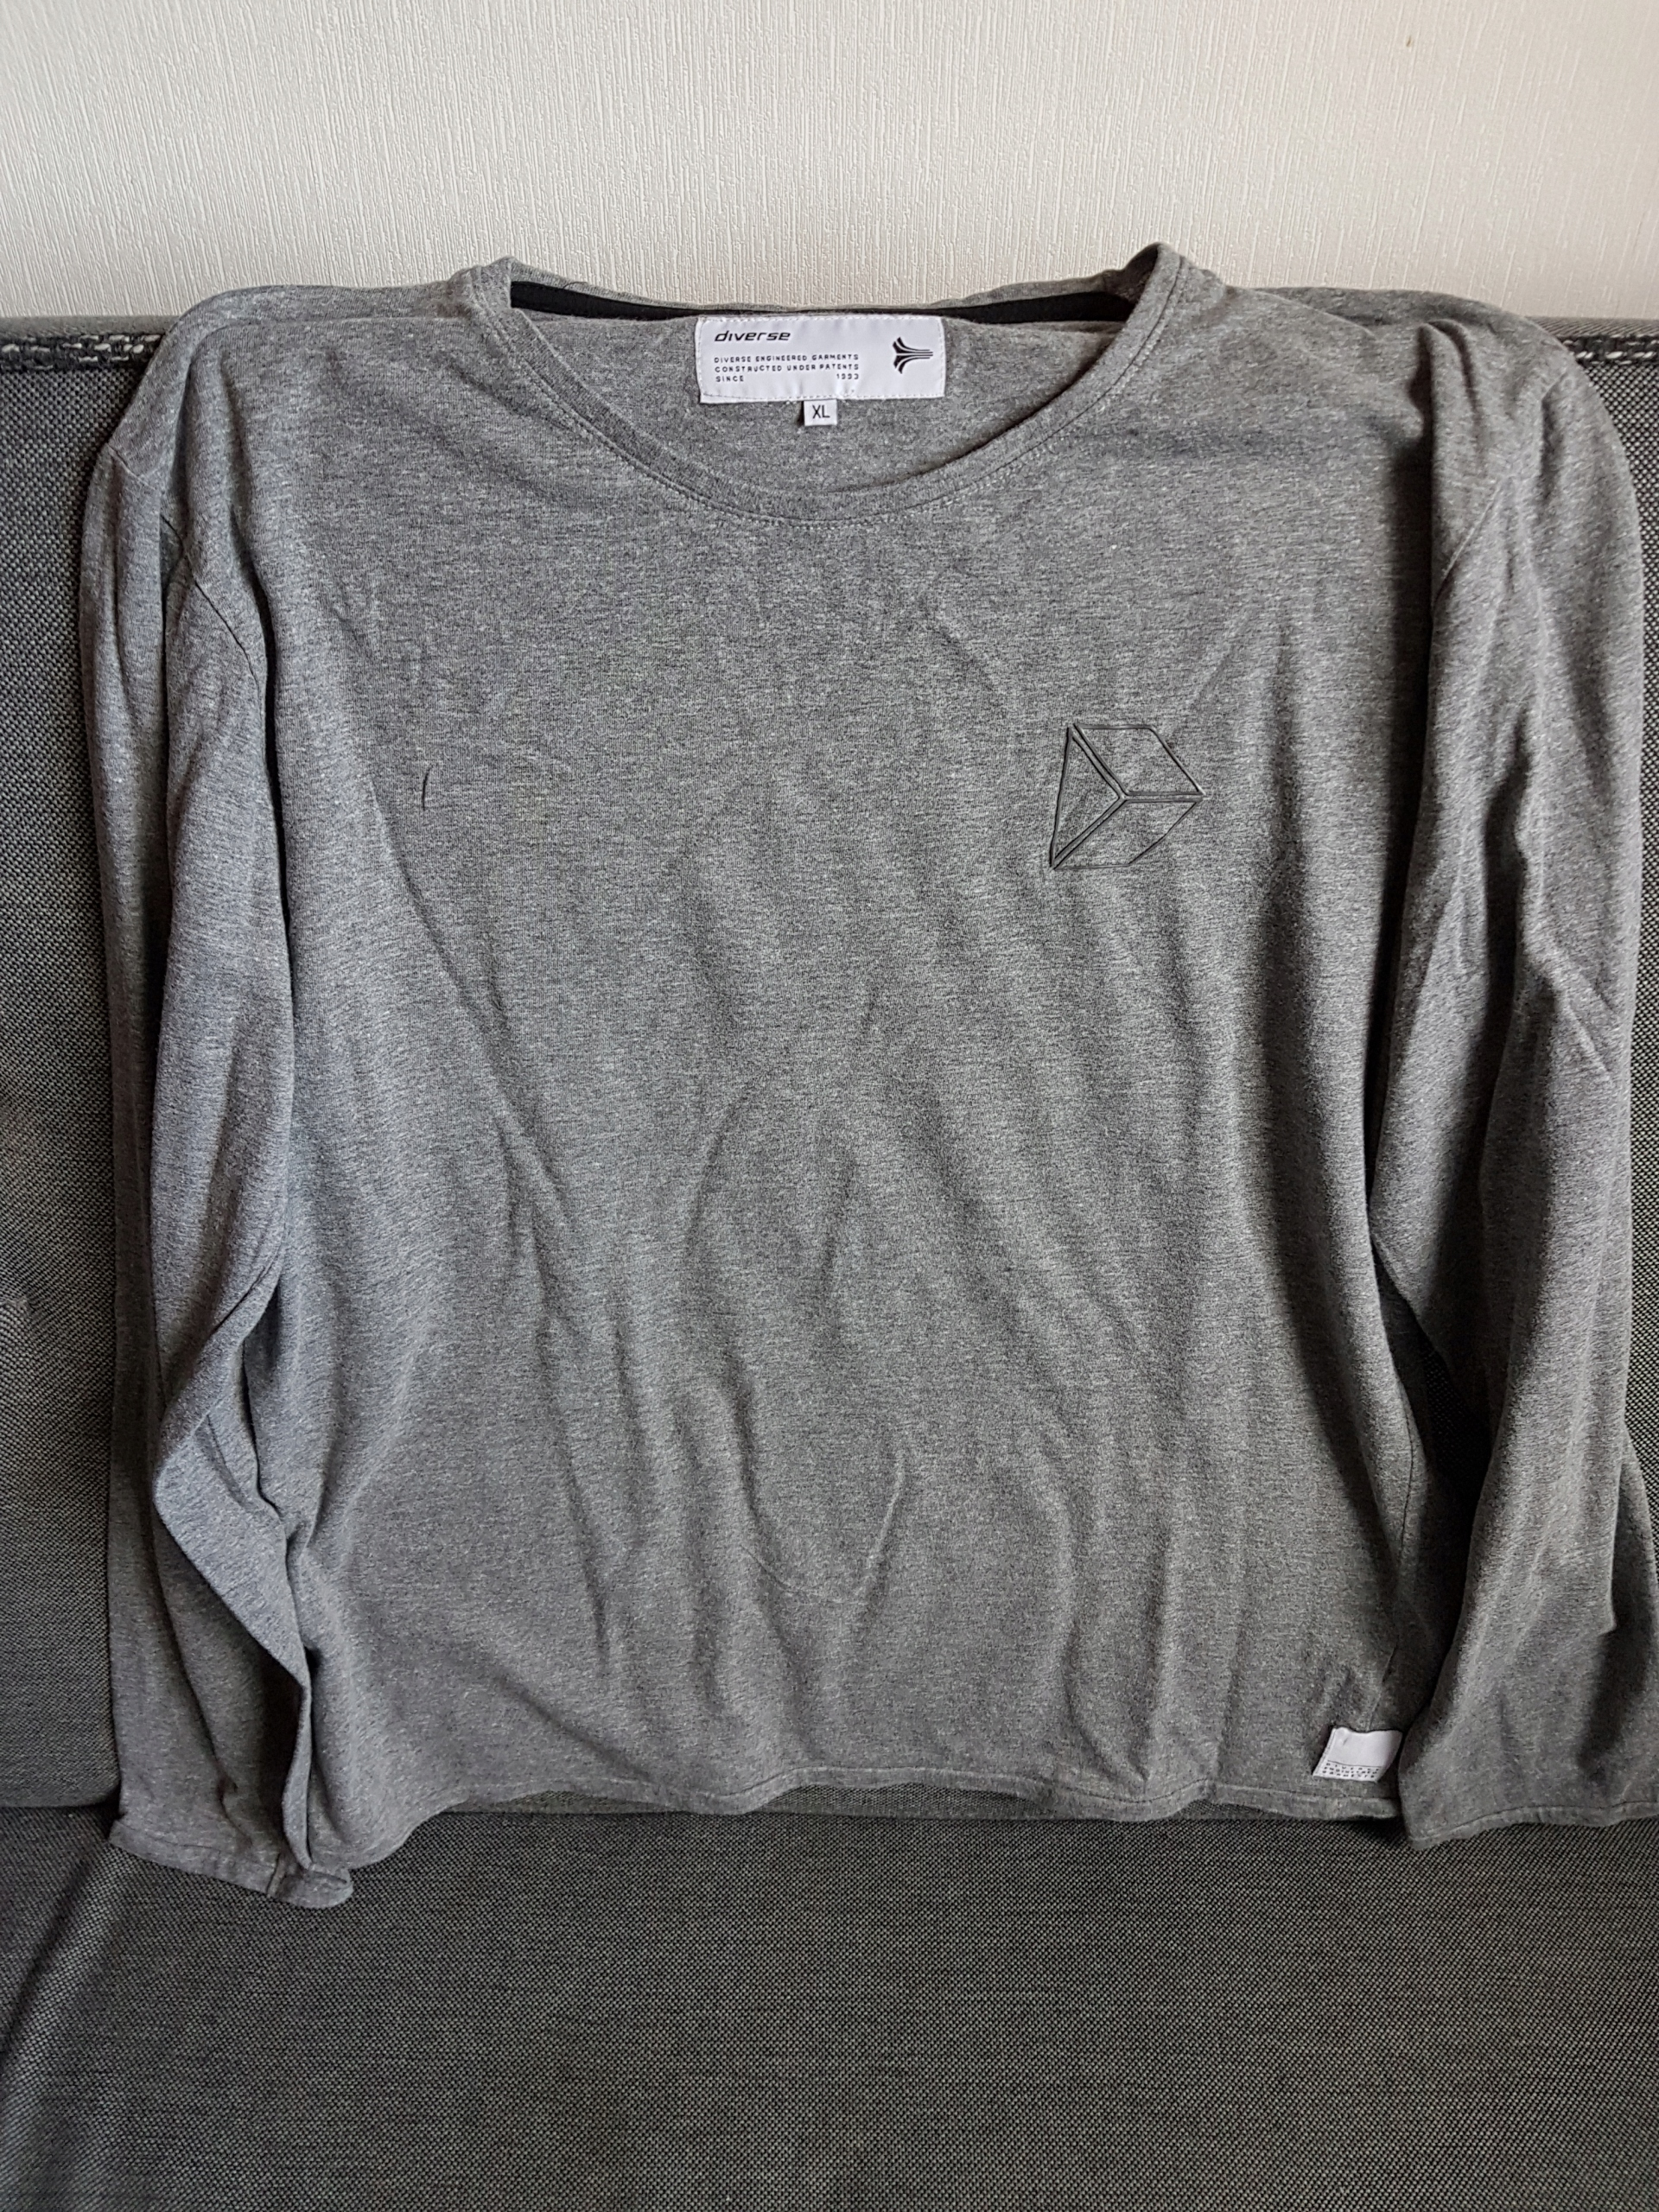 739b5a8de Koszulka długa Diverse XL regular bardzo fajna . - 7594651471 ...